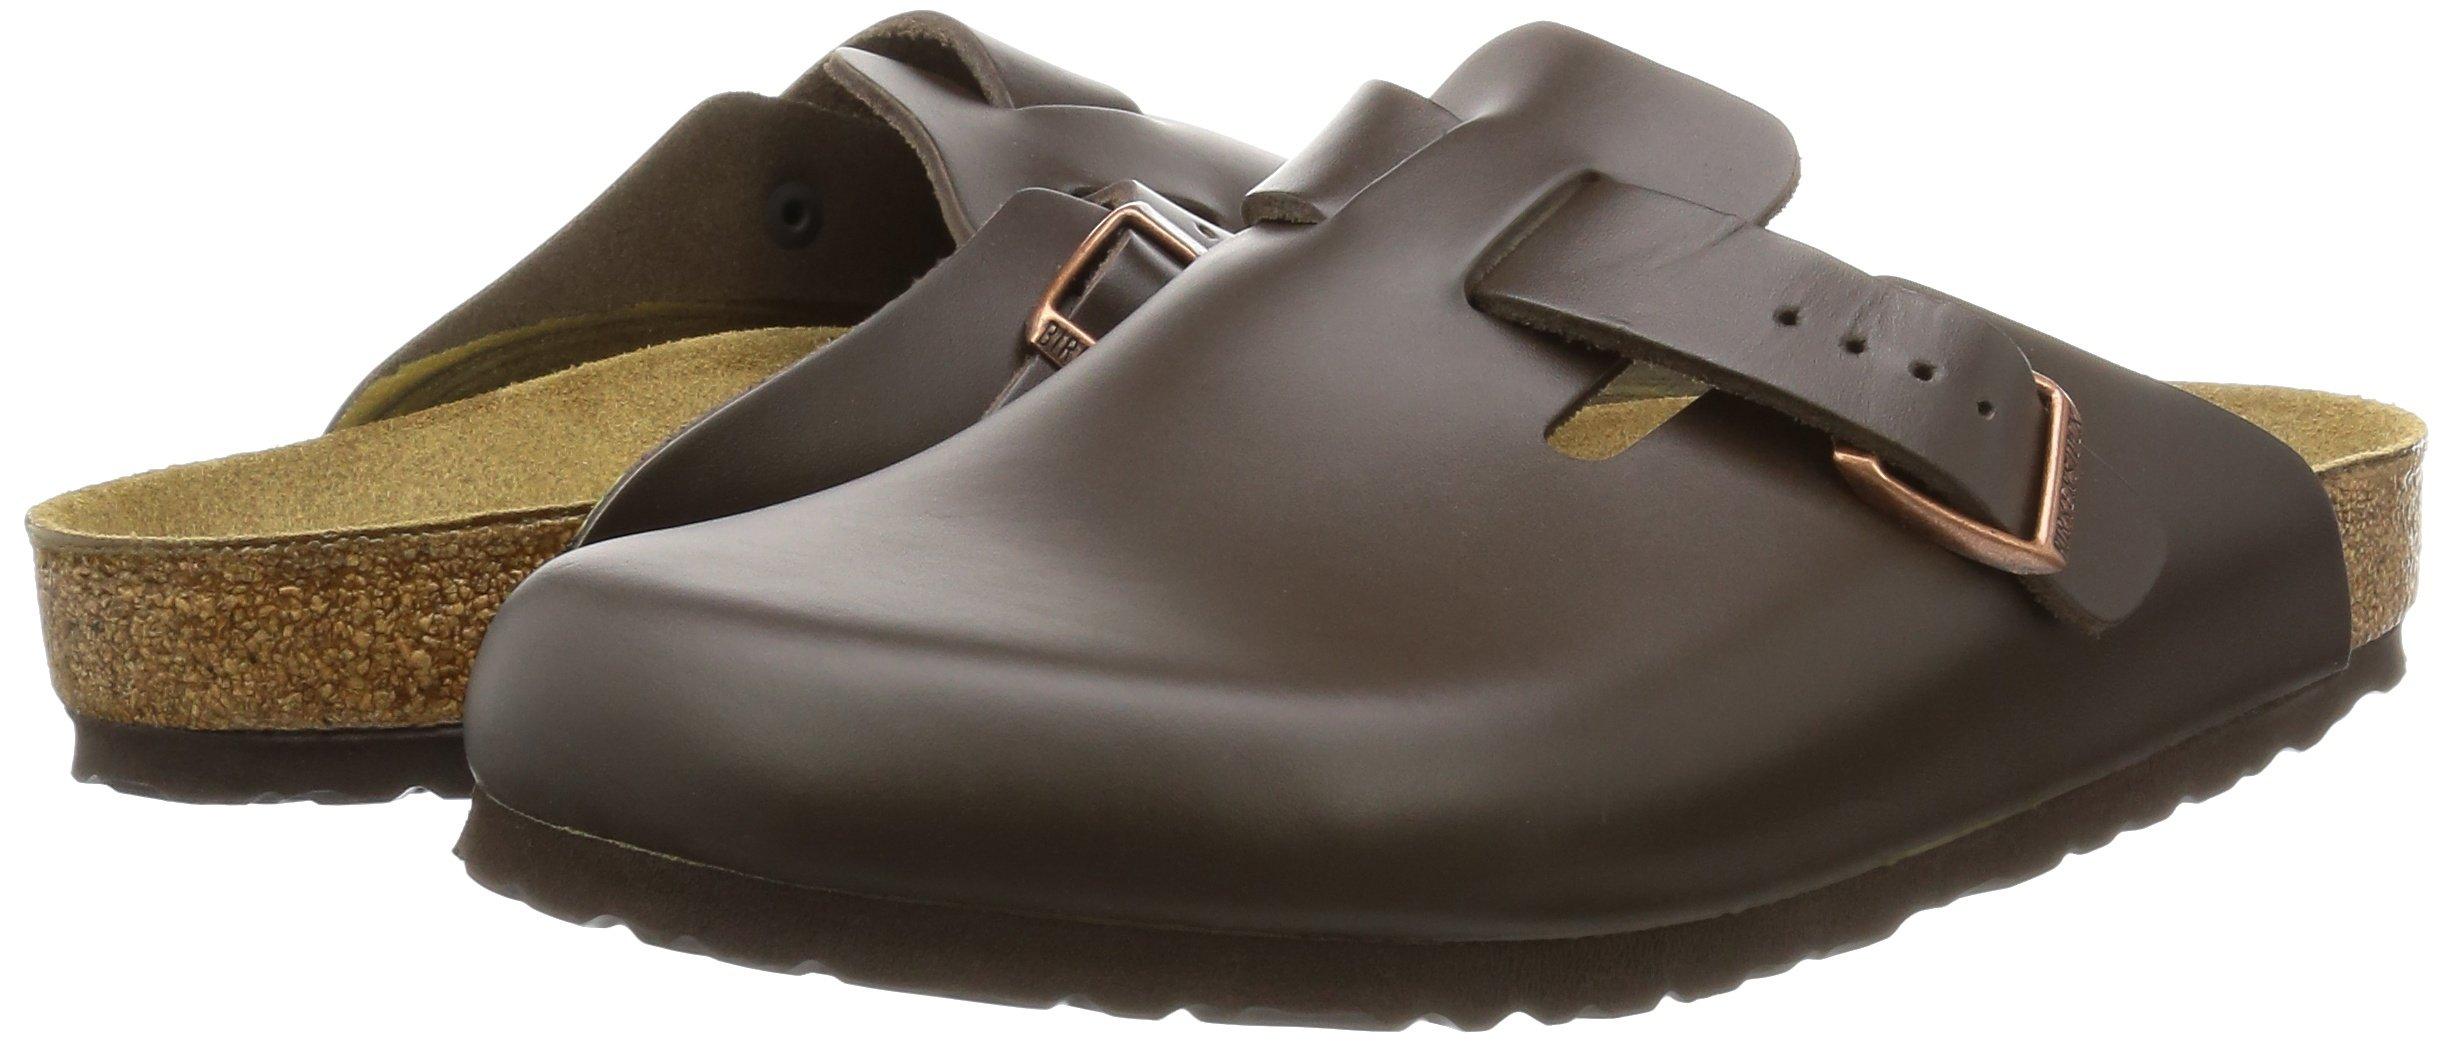 Birkenstock Boston, Unisex Adults' Clogs, Dark Brown Leather,8 UK by Birkenstock (Image #6)